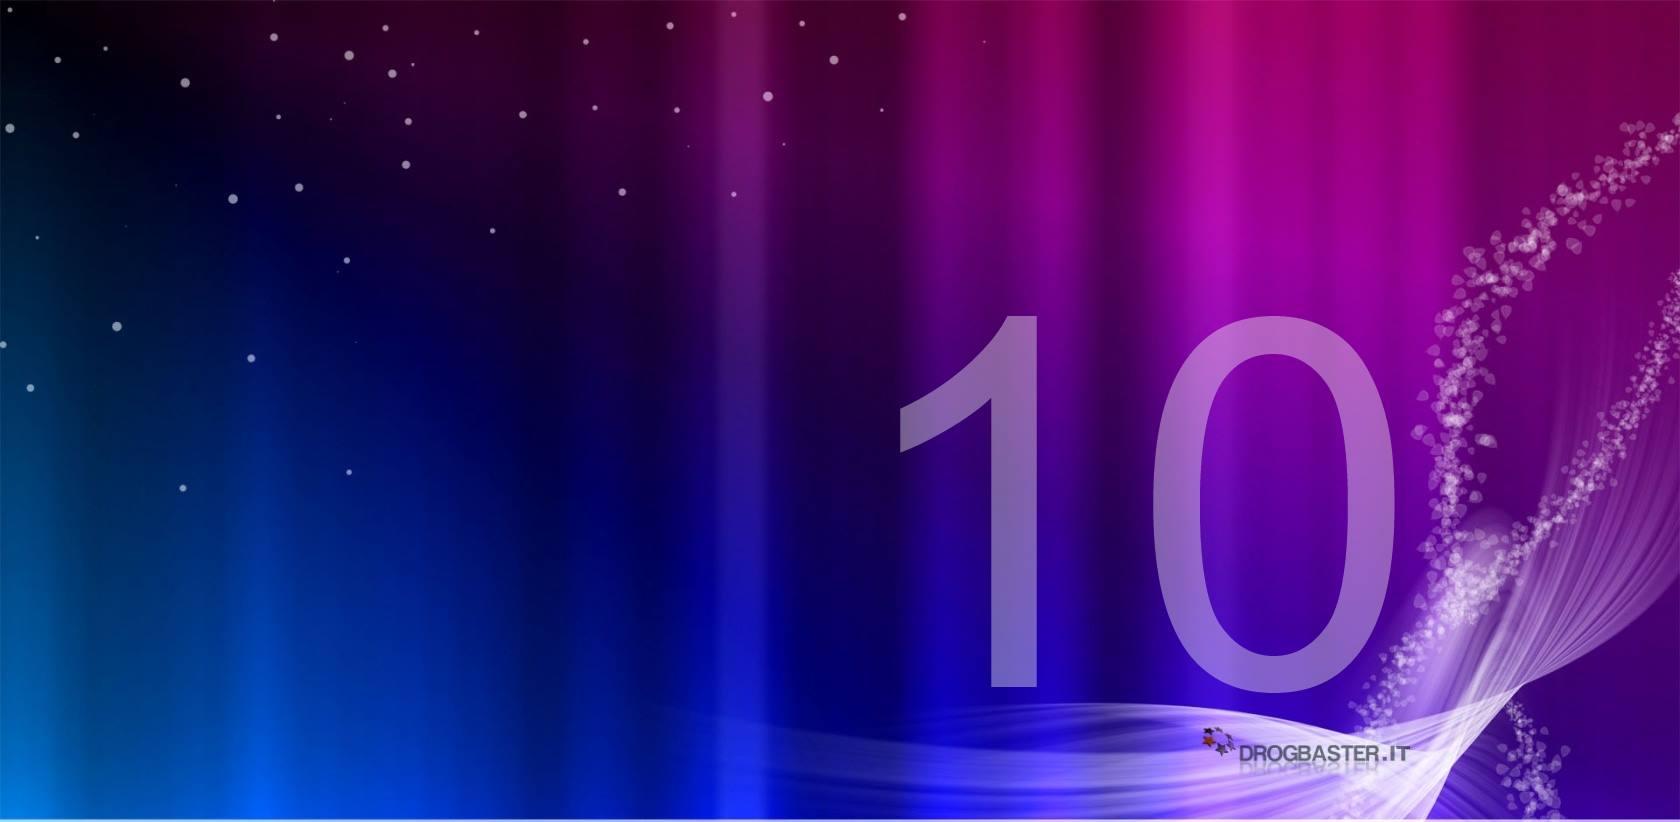 49 purple windows 10 wallpaper on wallpapersafari for Sfondi invernali per desktop gratis